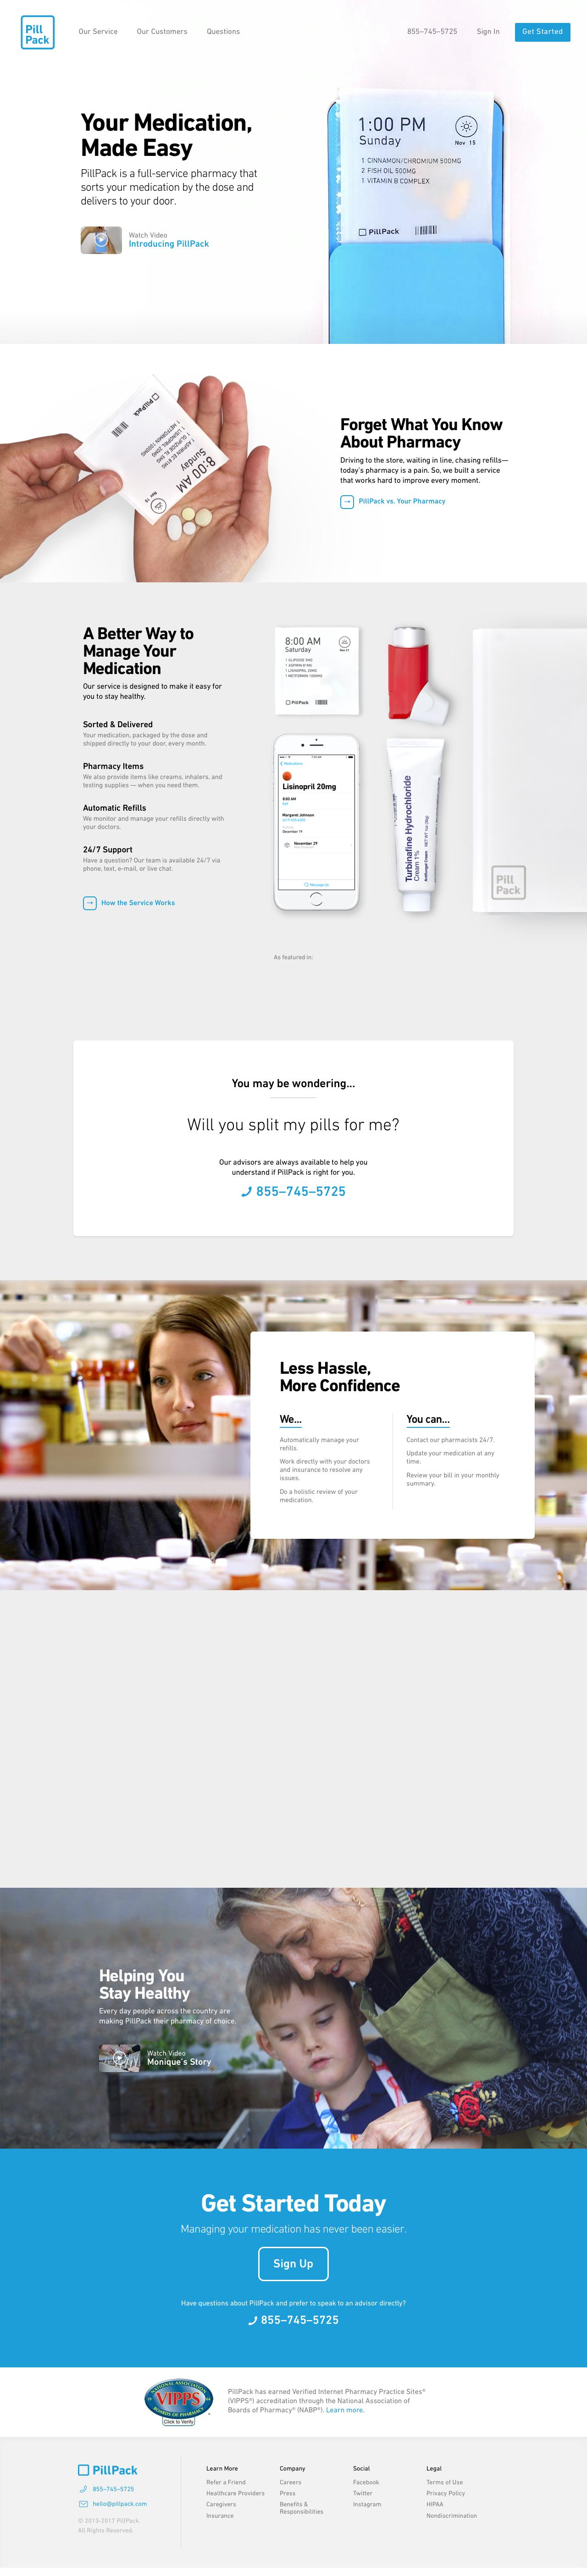 Screenshot of pillpack.com - PillPack - A Pharmacy Designed for You - captured June 14, 2017